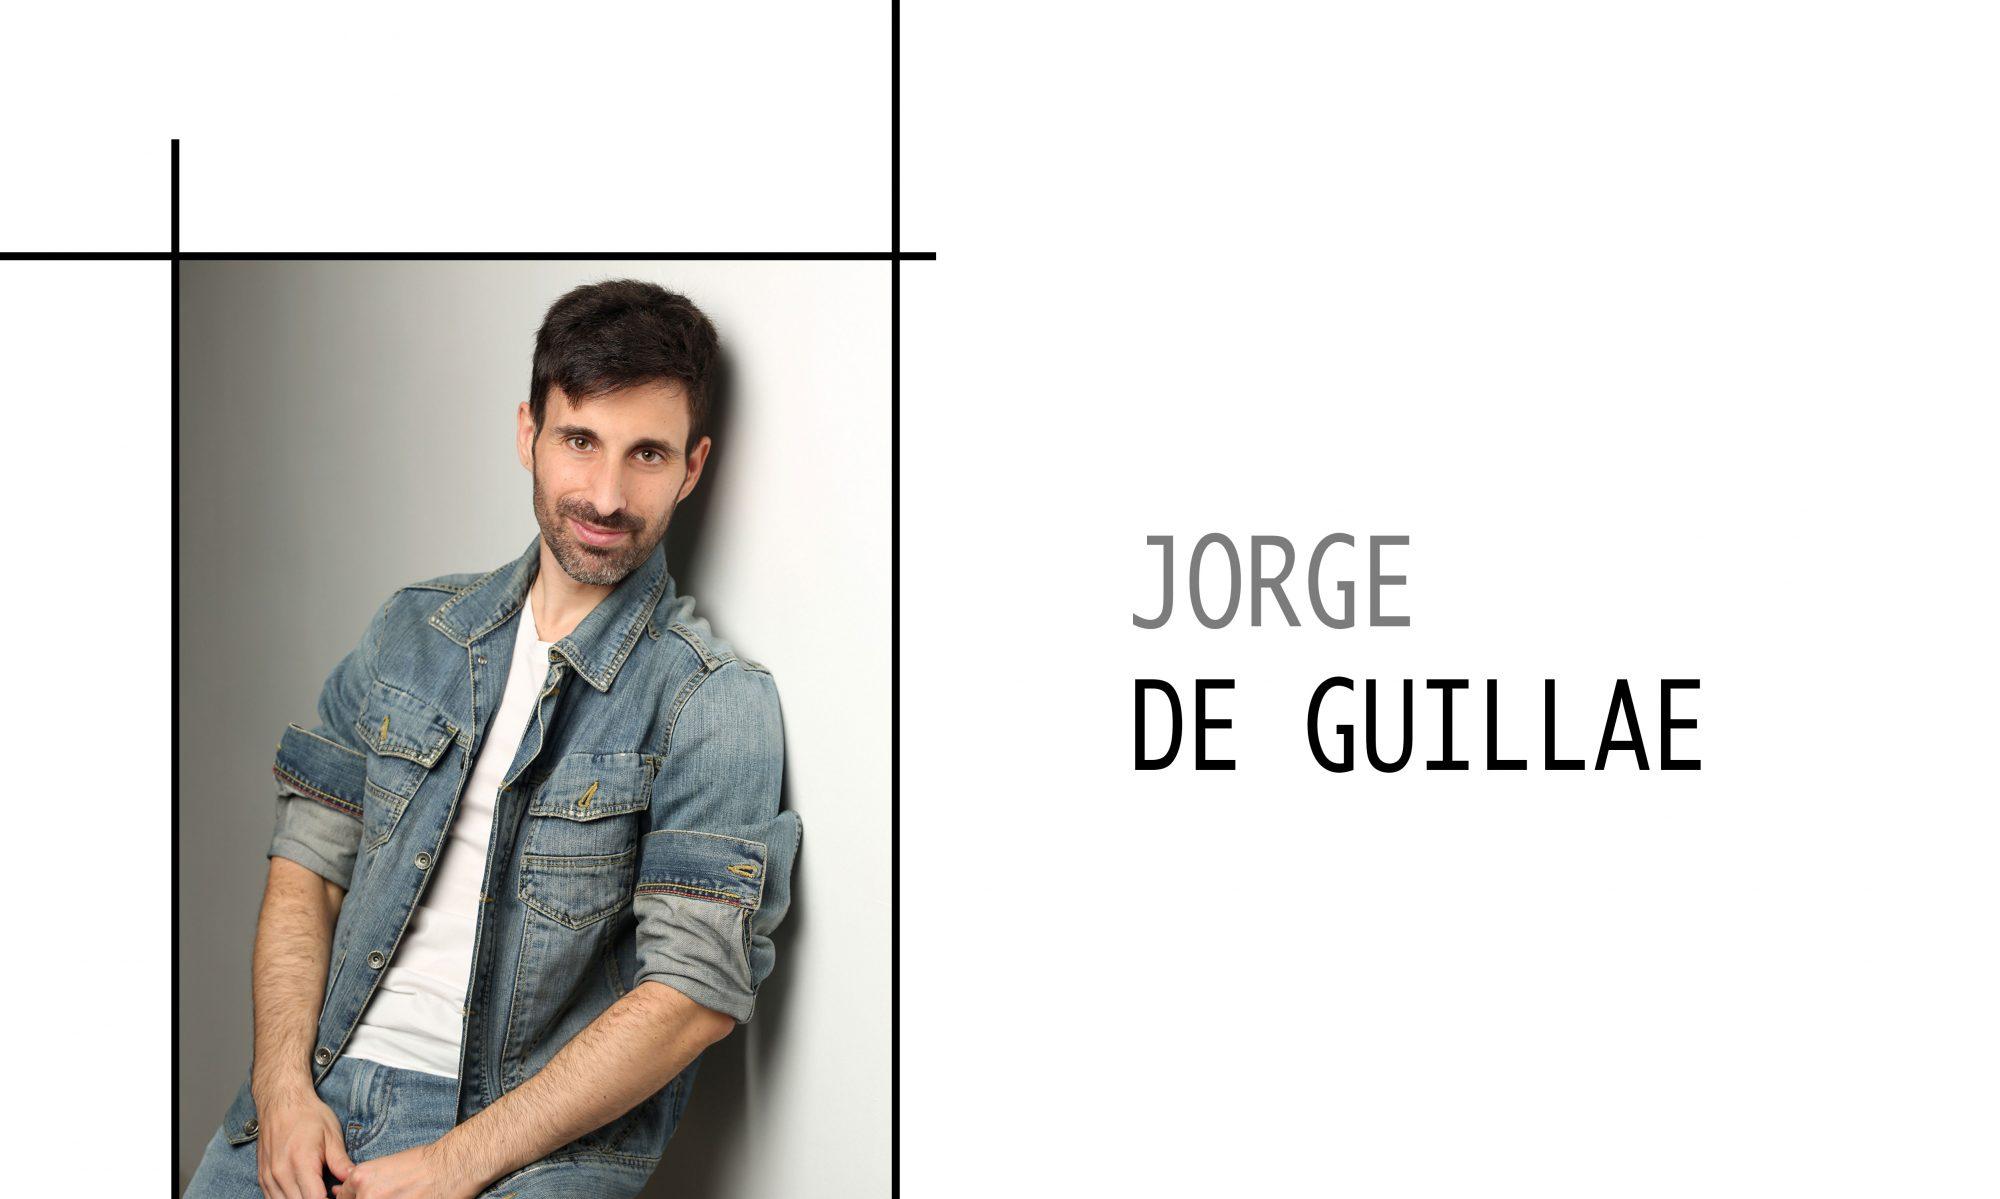 Jorge de Guillae